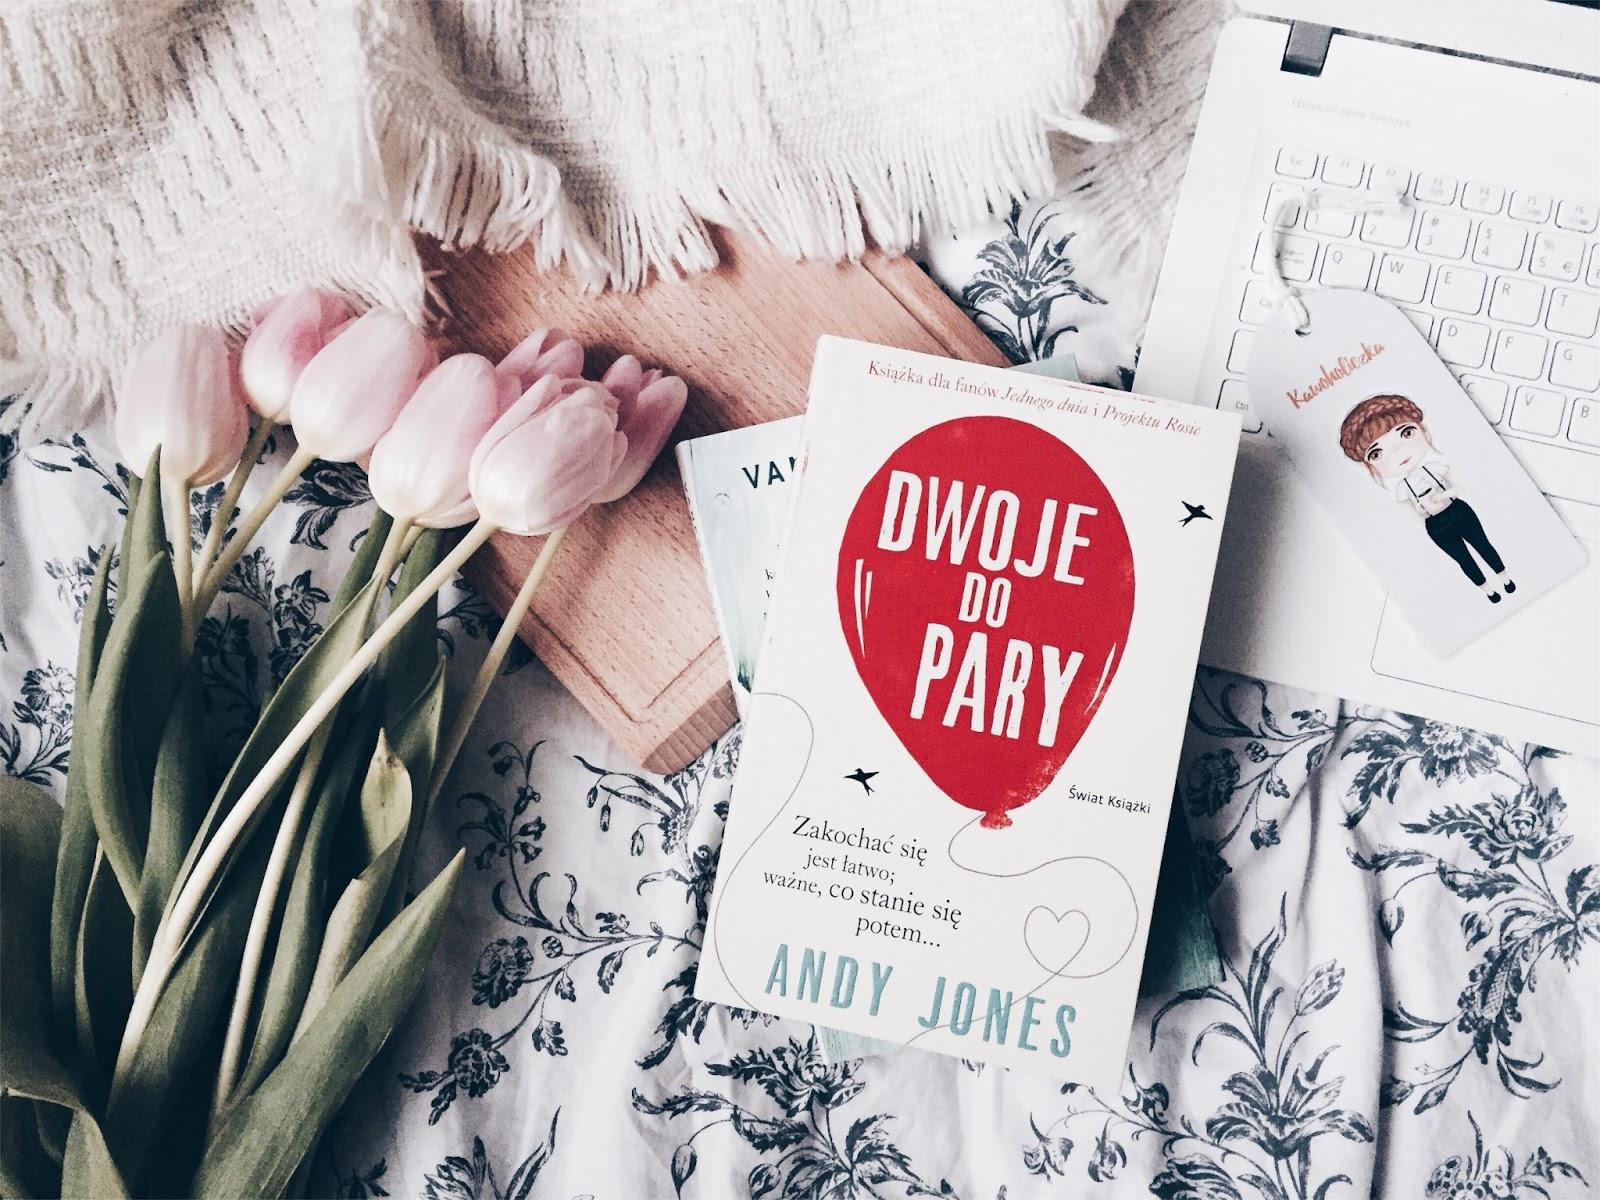 Dwoje do pary, Andy Jones